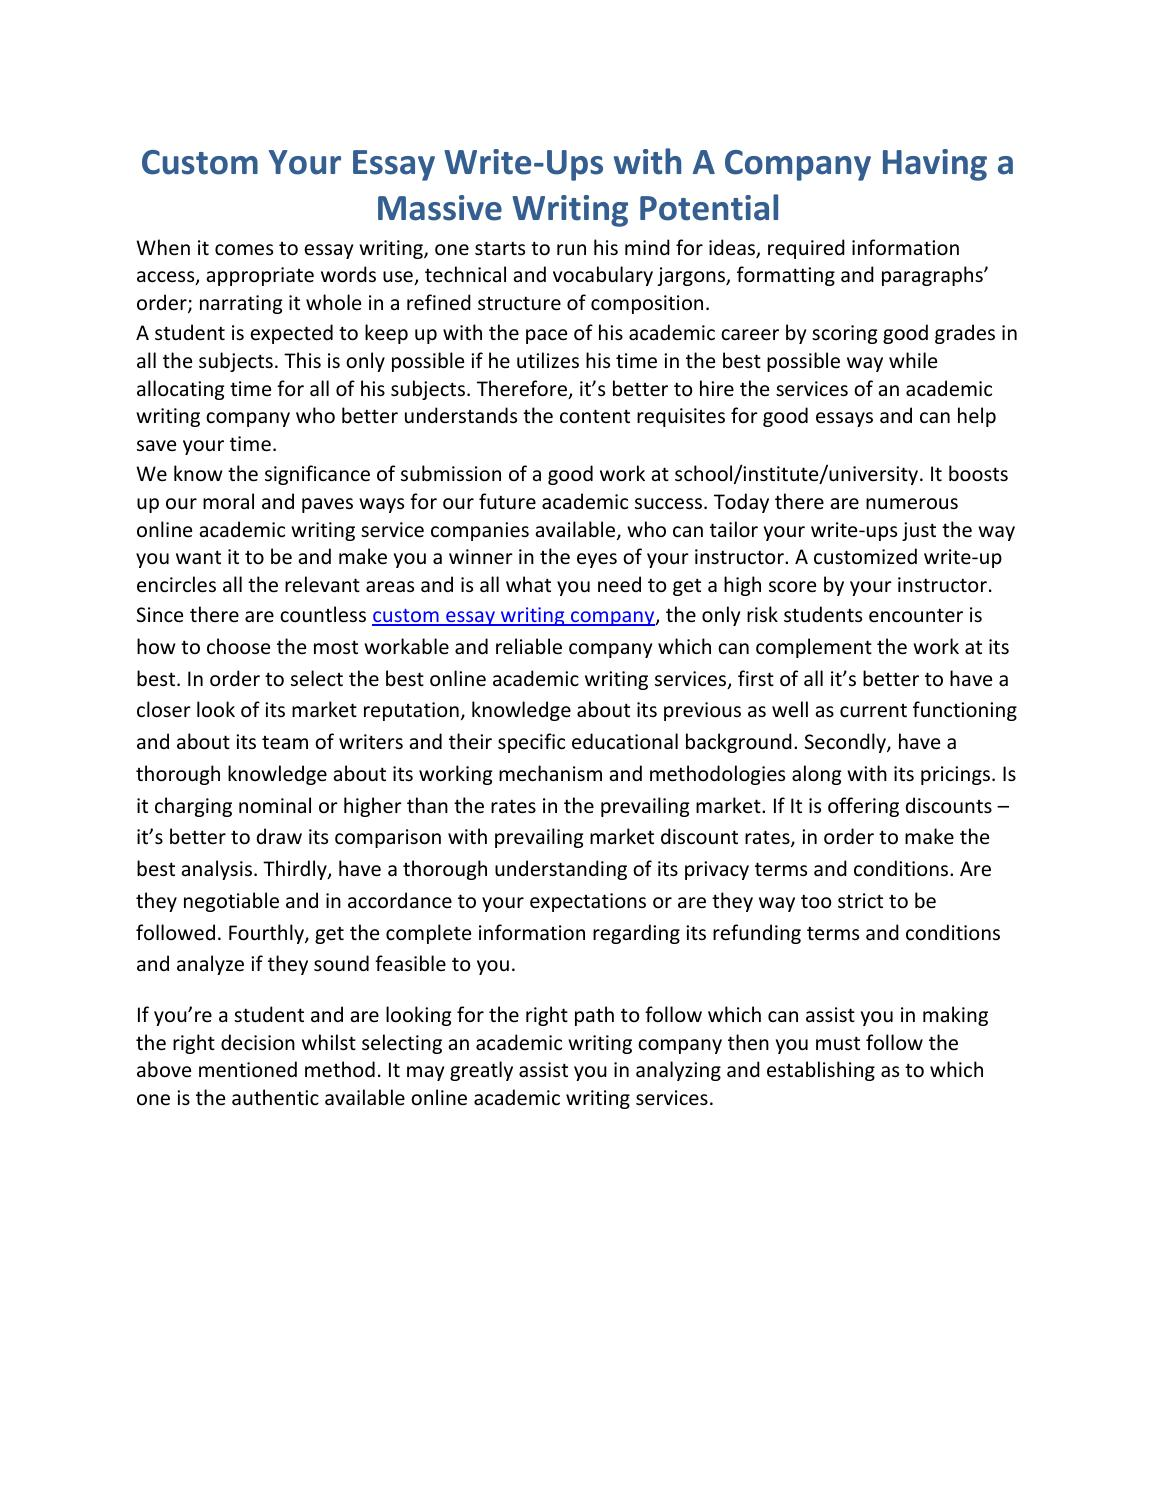 Dissertation masters education